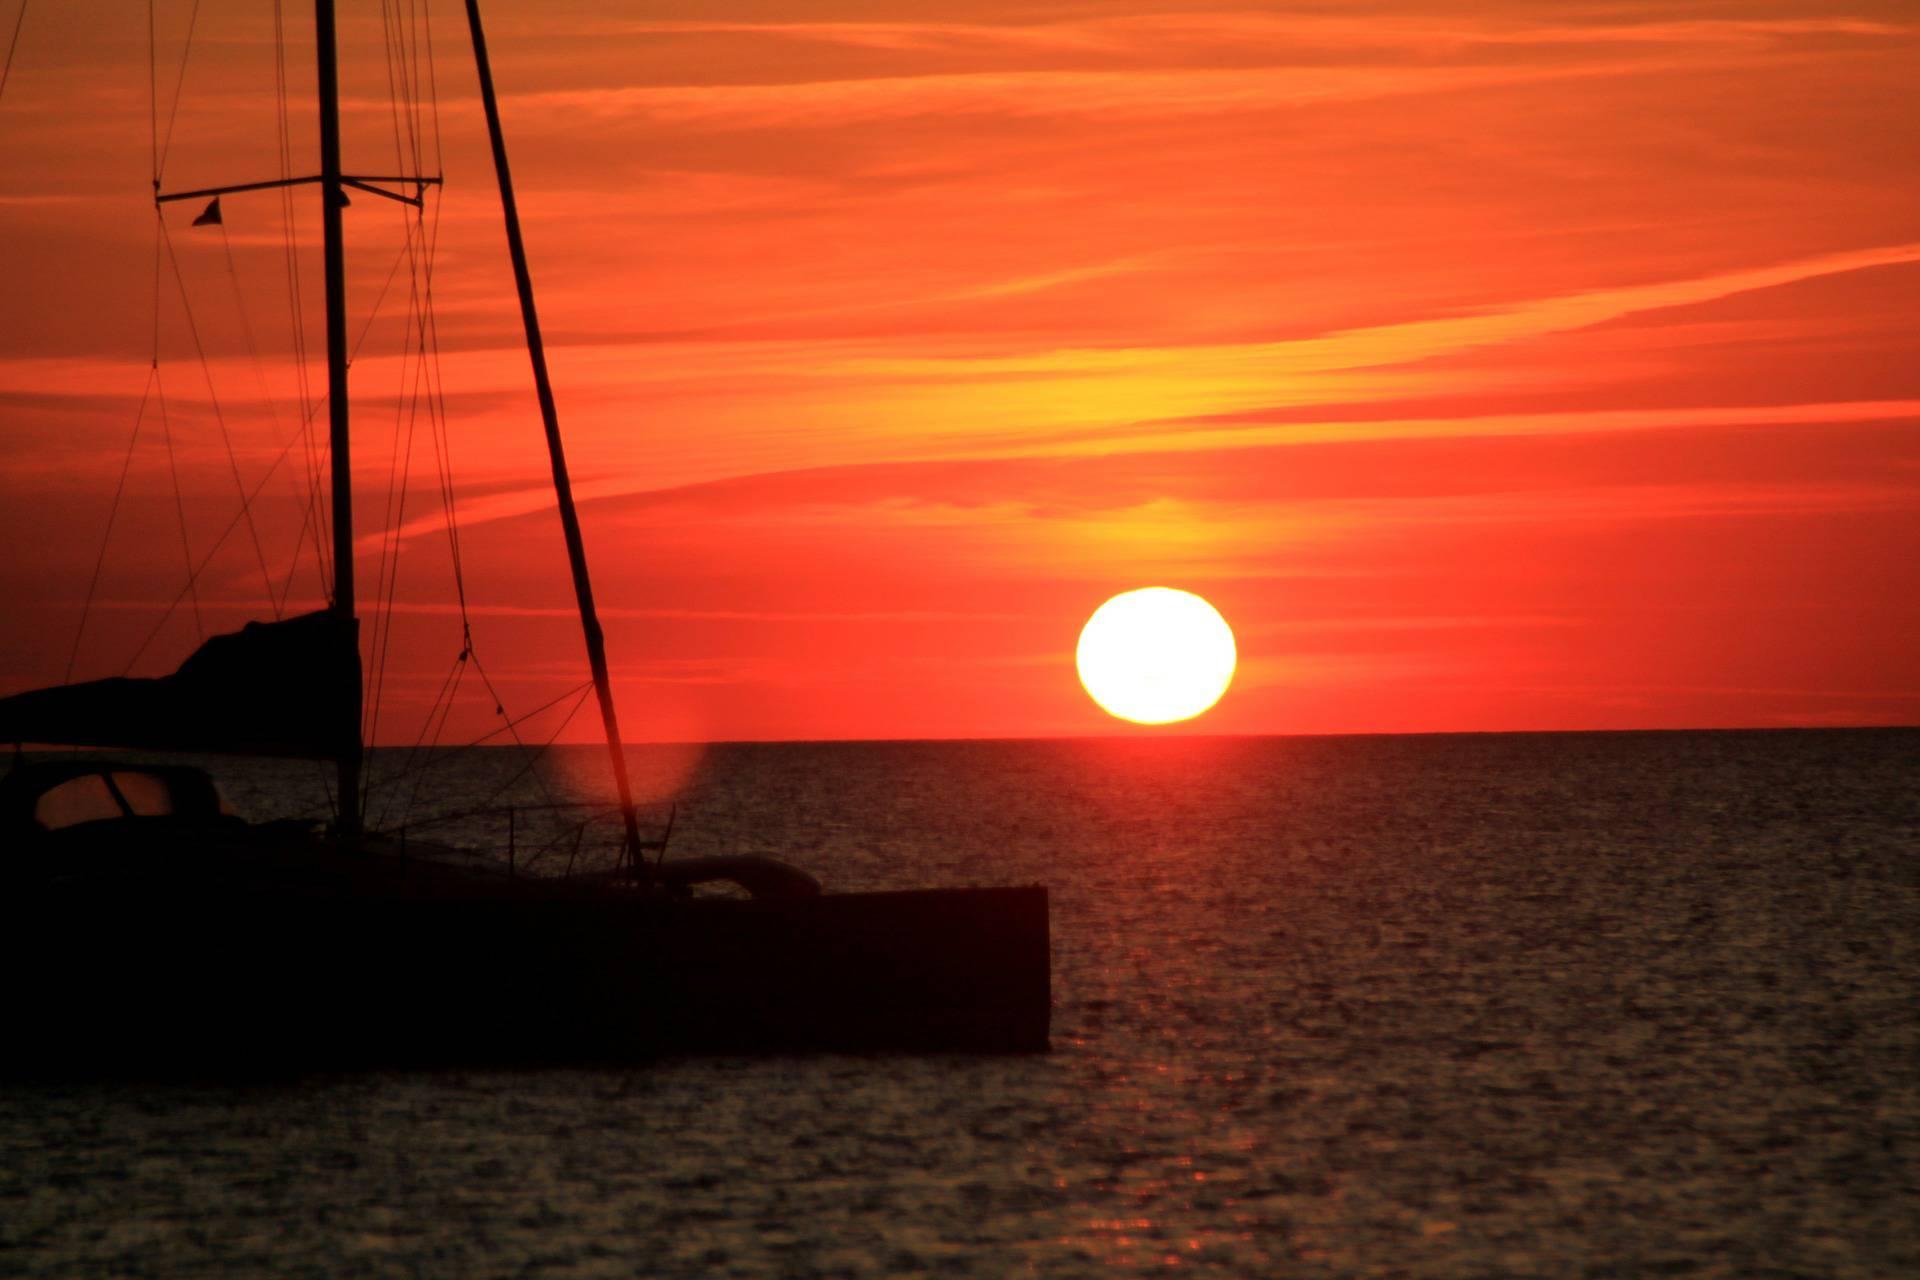 coucher de soleil voilier mer